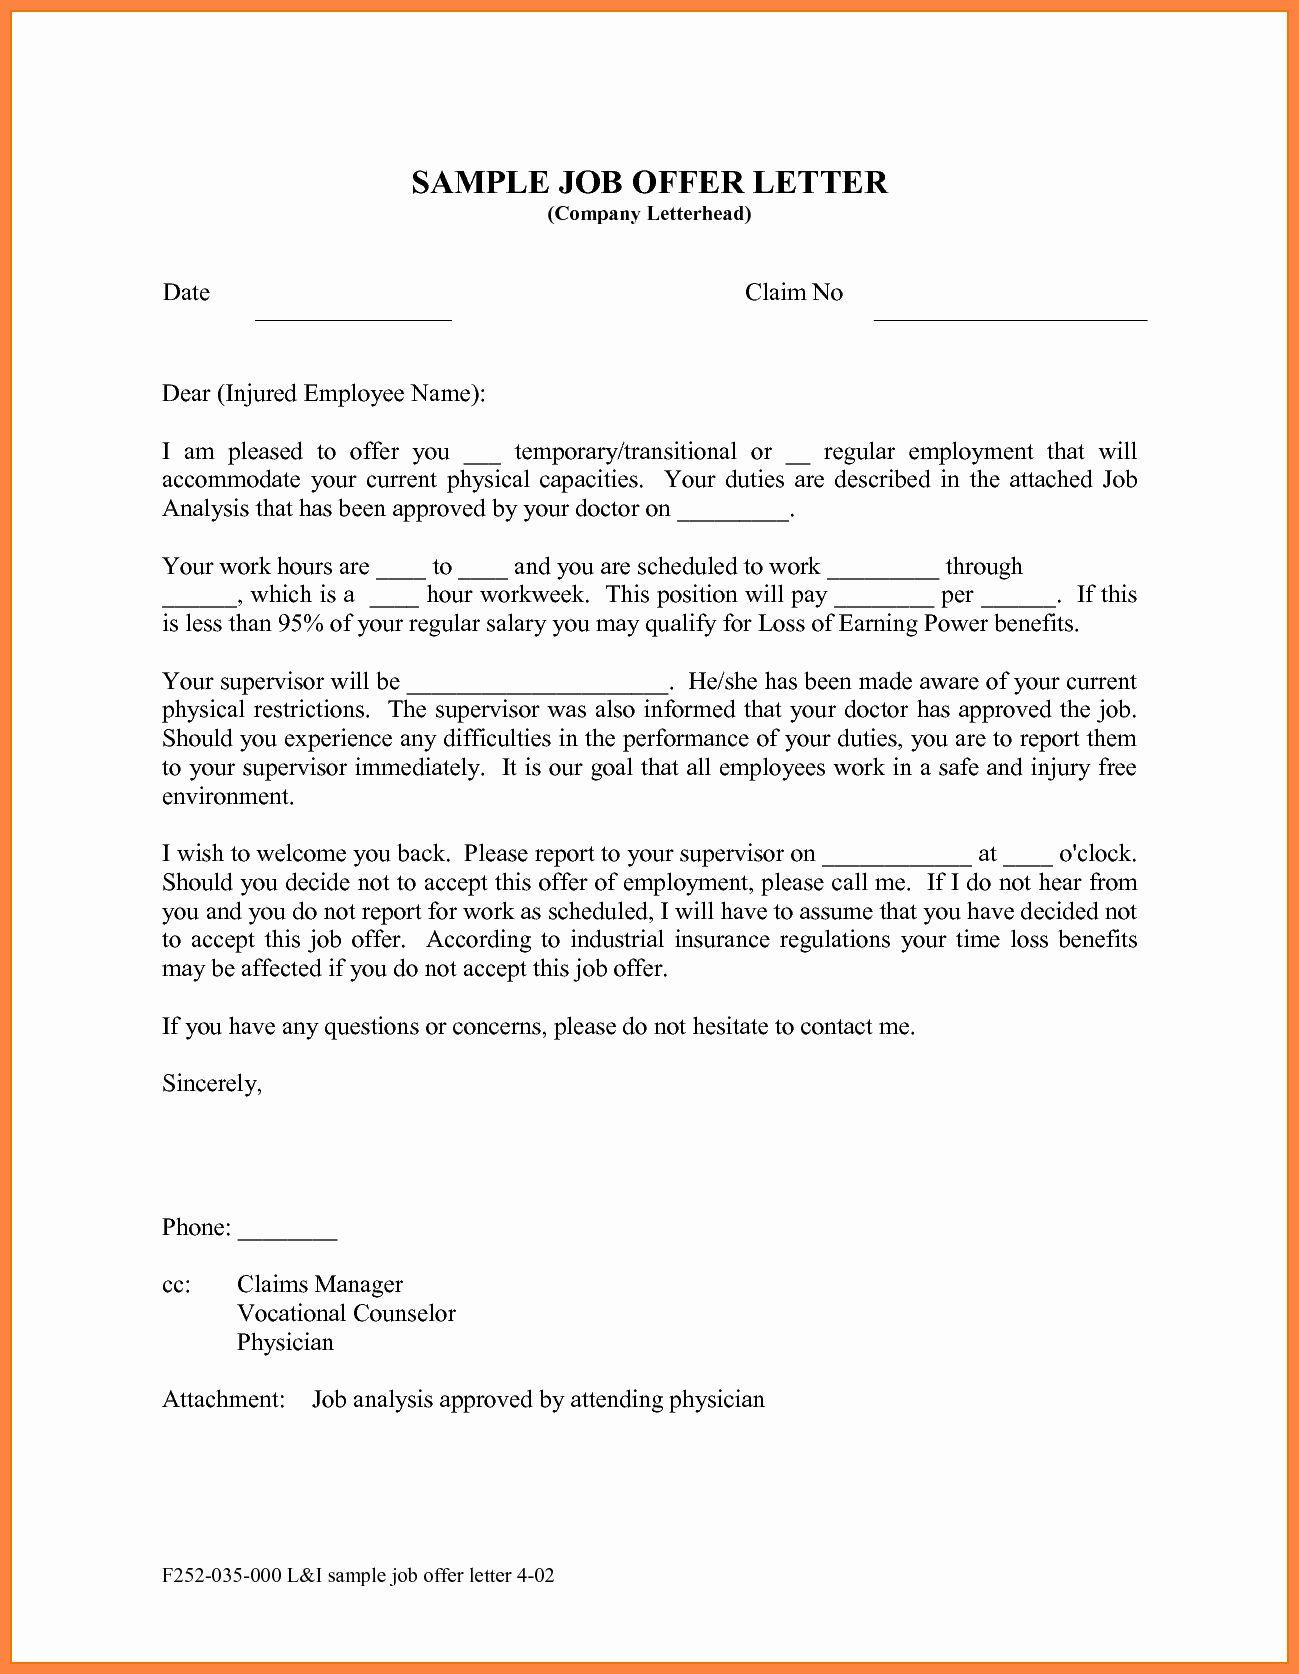 job offer letter example inspirational 10 of describe career objectives internship cv free template word doc